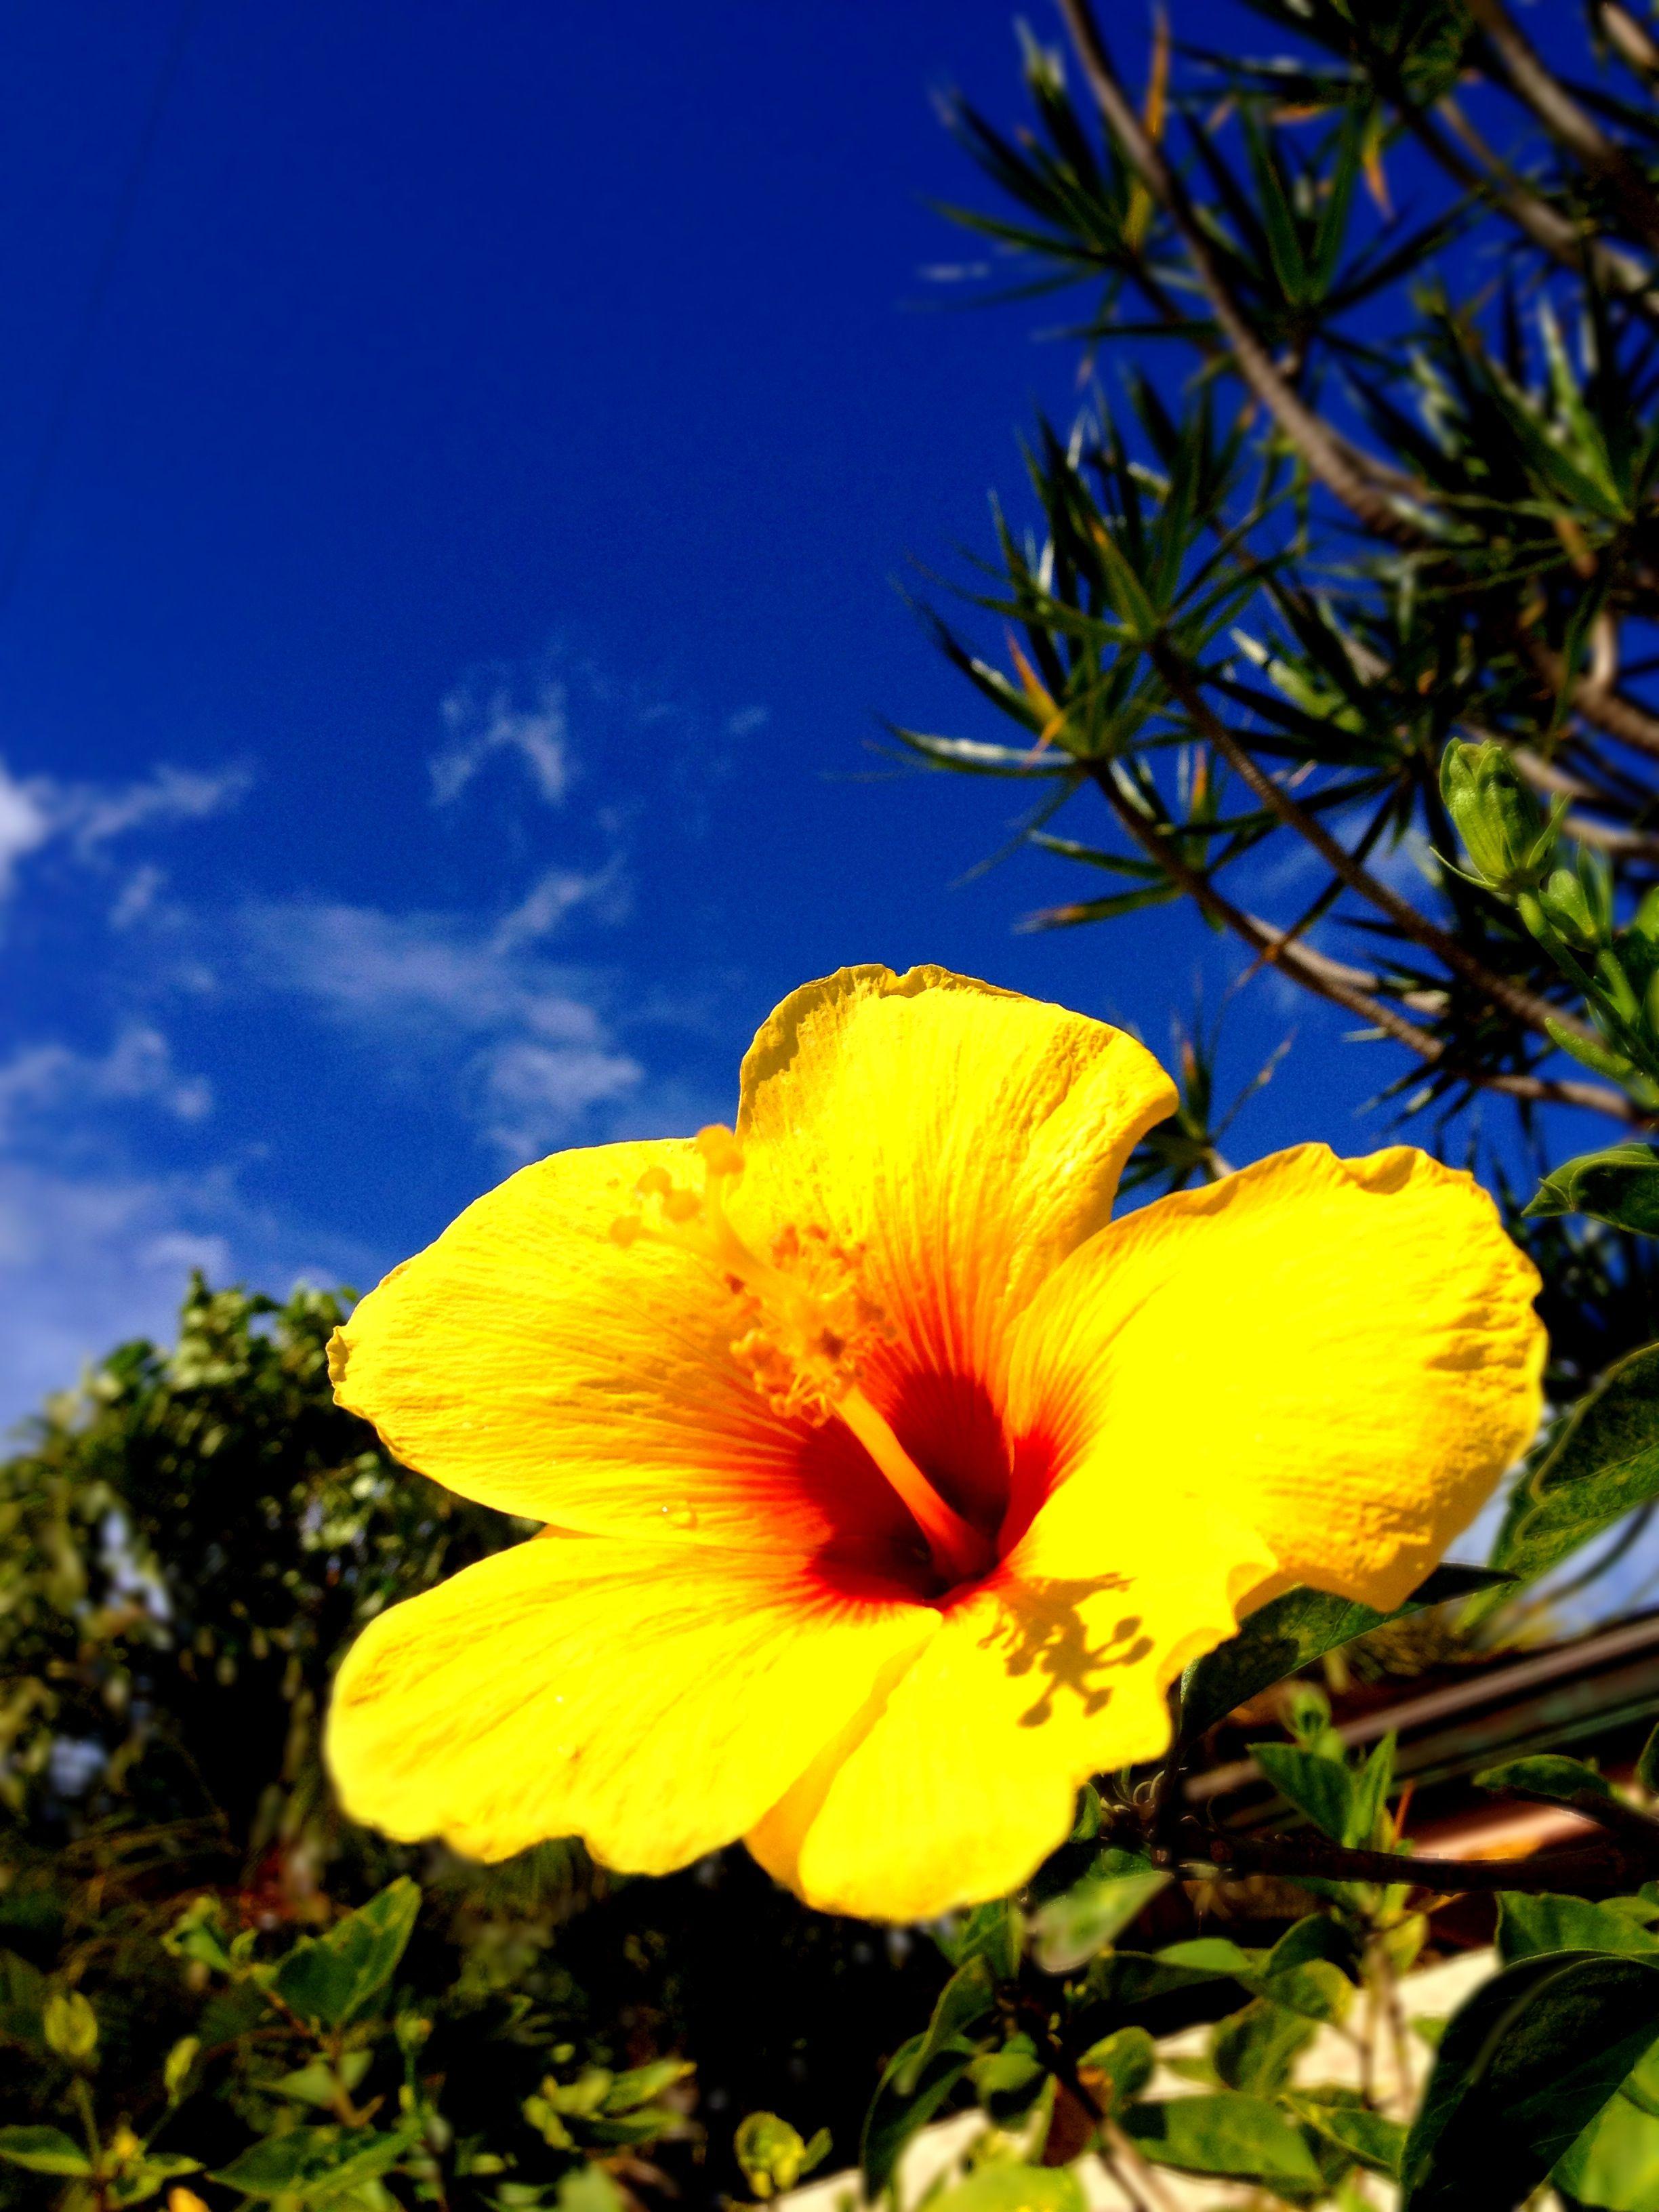 Hawaiis state flower the yellow hibiscus all things aloha hawaiis state flower the yellow hibiscus izmirmasajfo